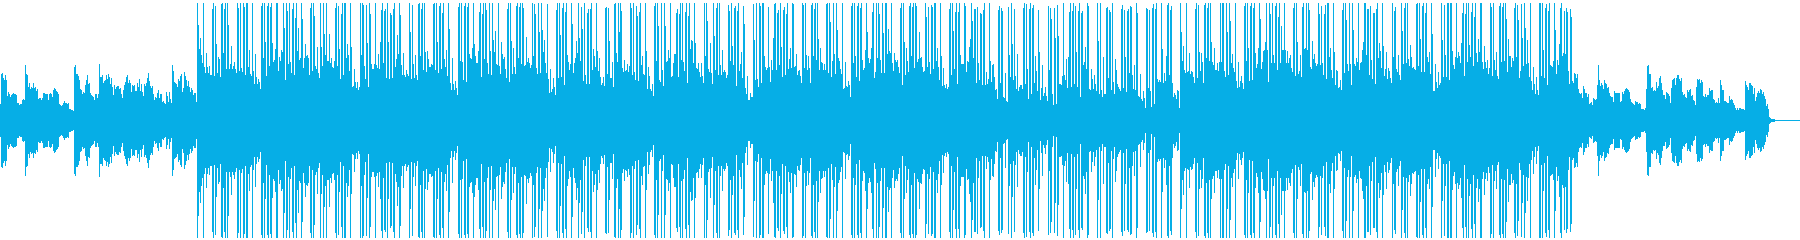 Lo-Fiのヒップホップビートの再生済みの波形